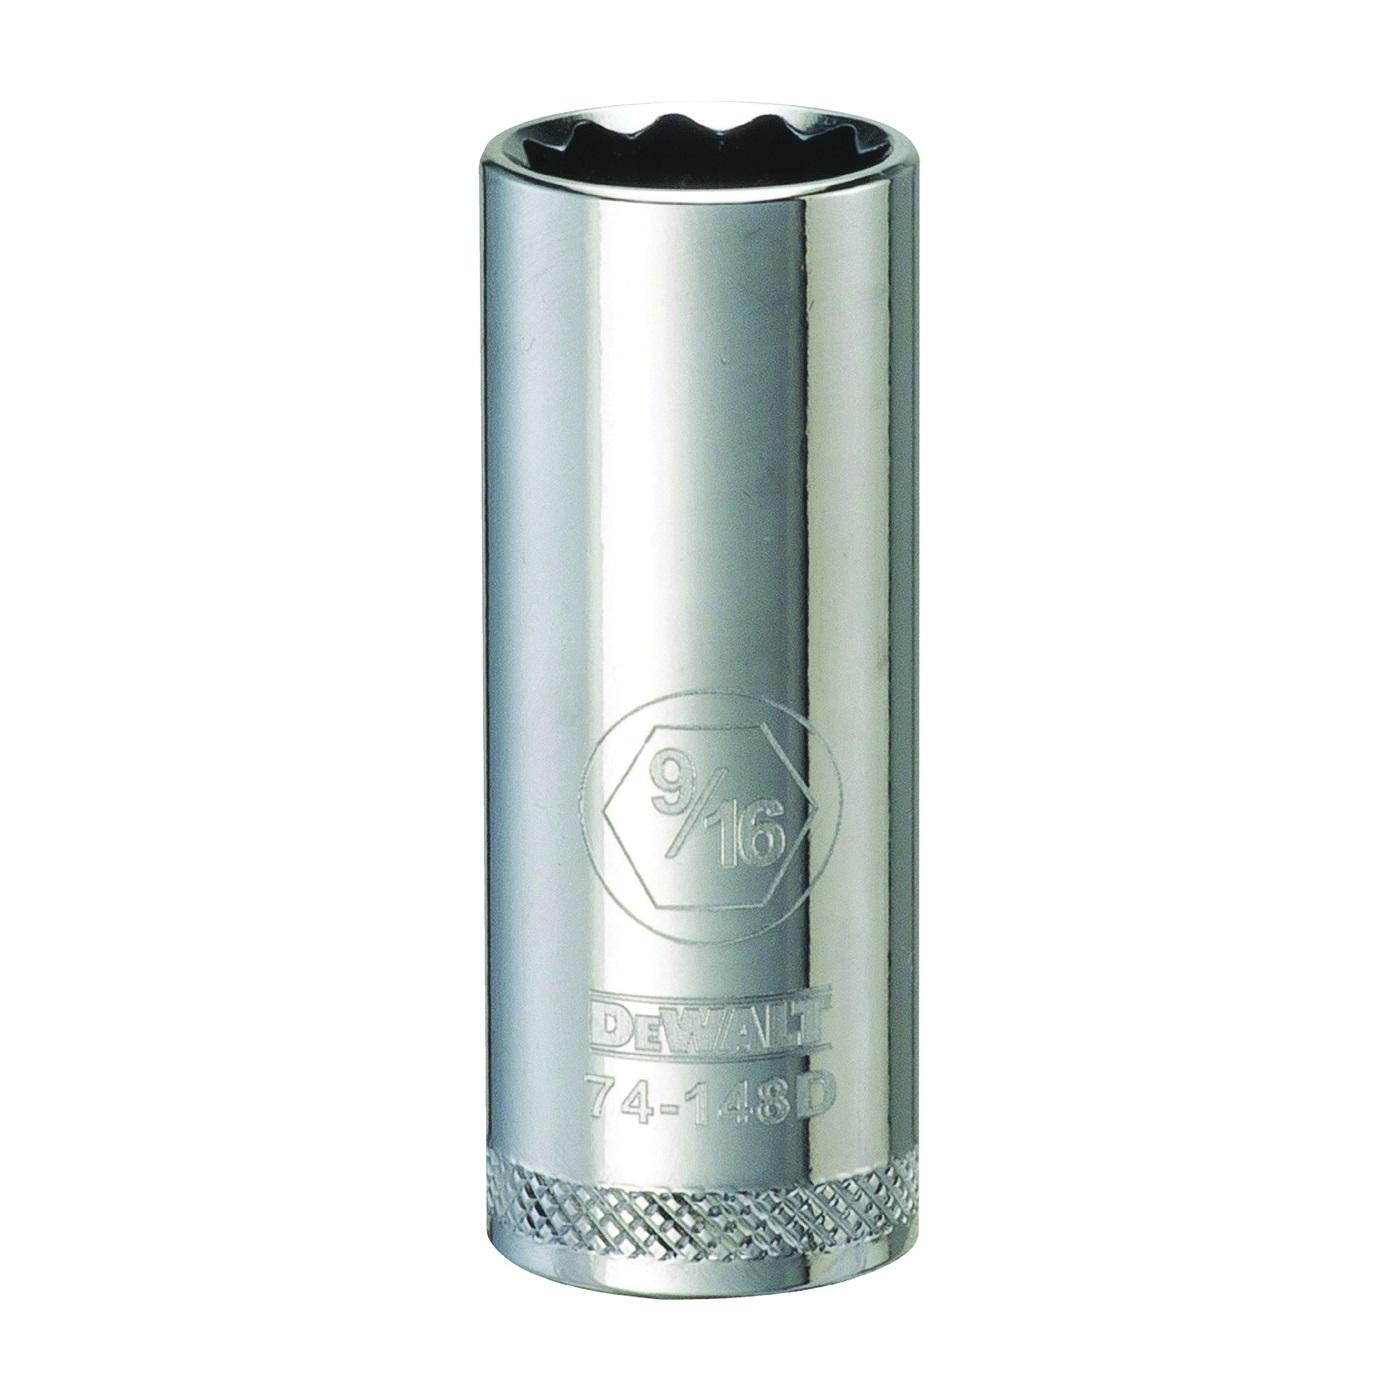 Picture of DeWALT DWMT74148OSP Drive Socket, 9/16 in Socket, 3/8 in Drive, 12 -Point, Vanadium Steel, Polished Chrome